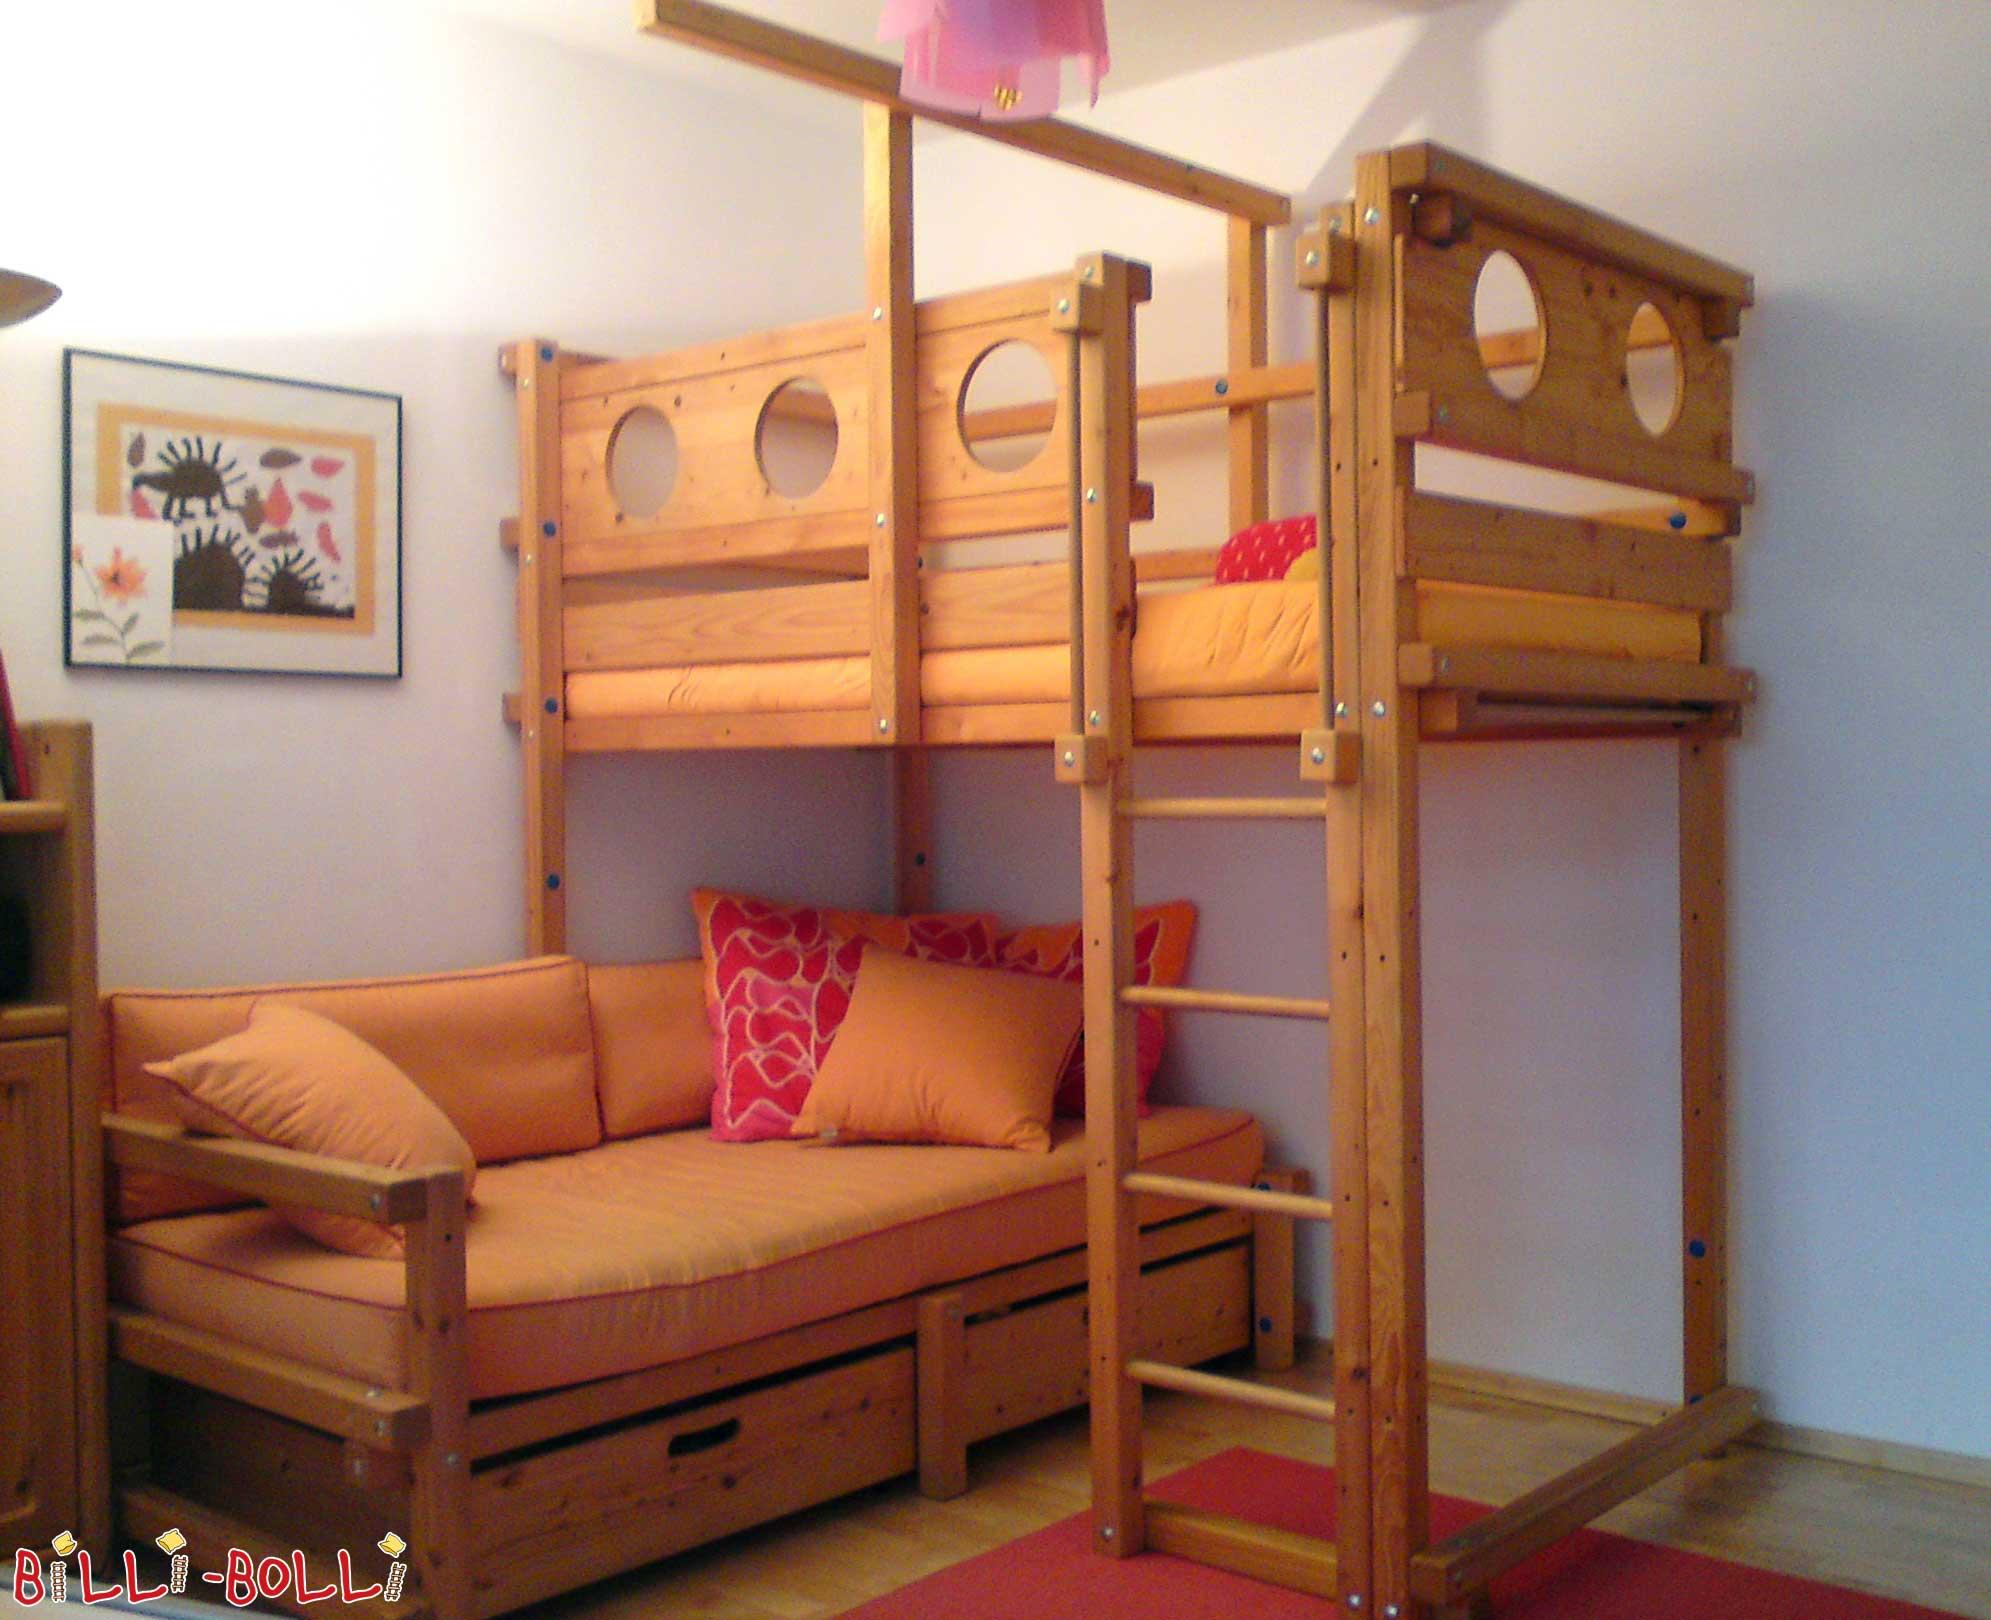 Billi Bolli corner bunk bed billi bolli furniture